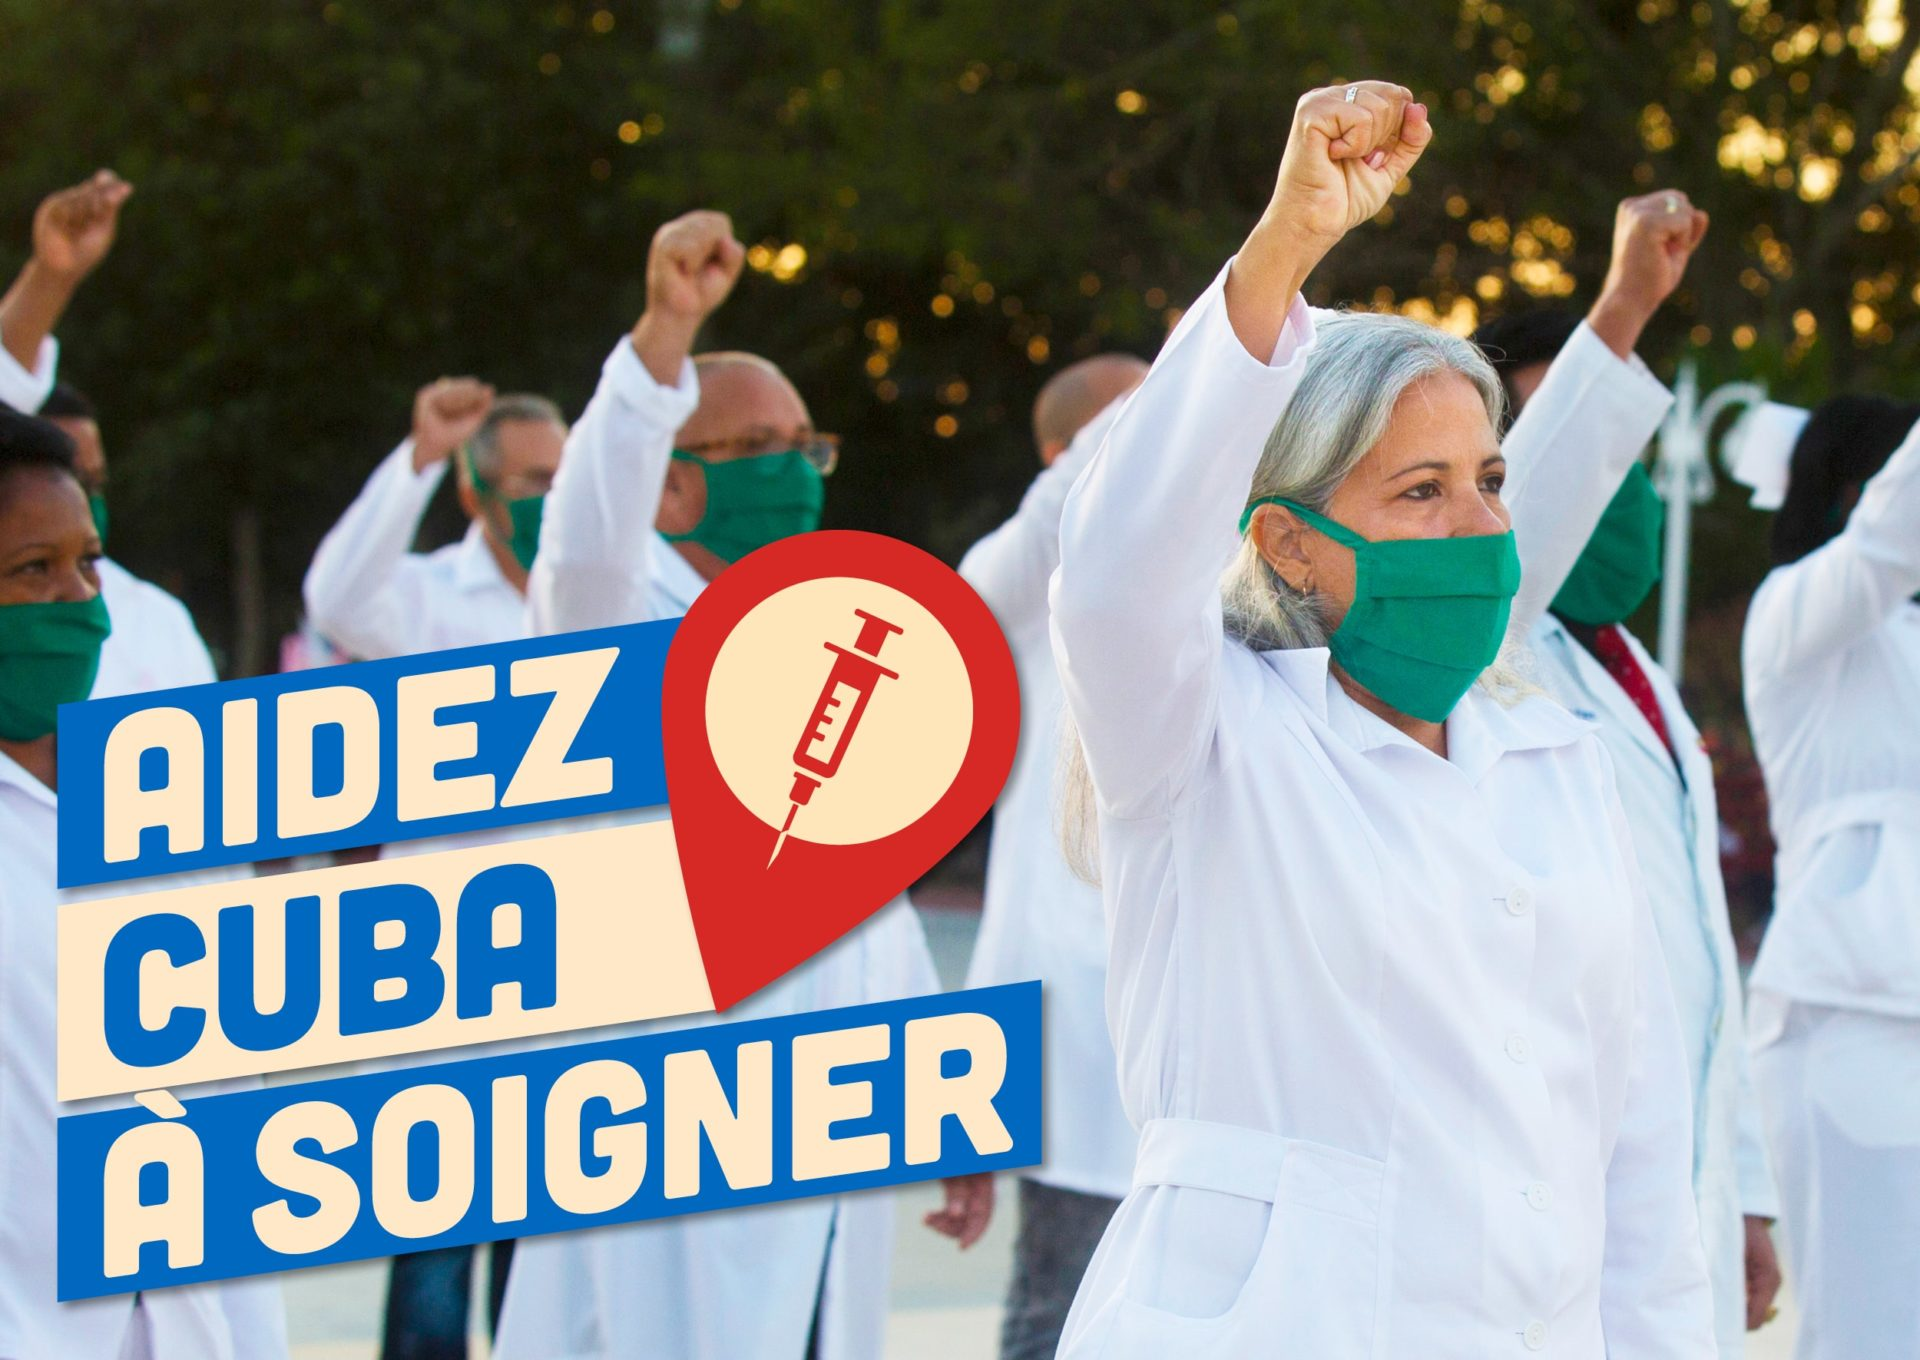 Aidez Cuba à soigner